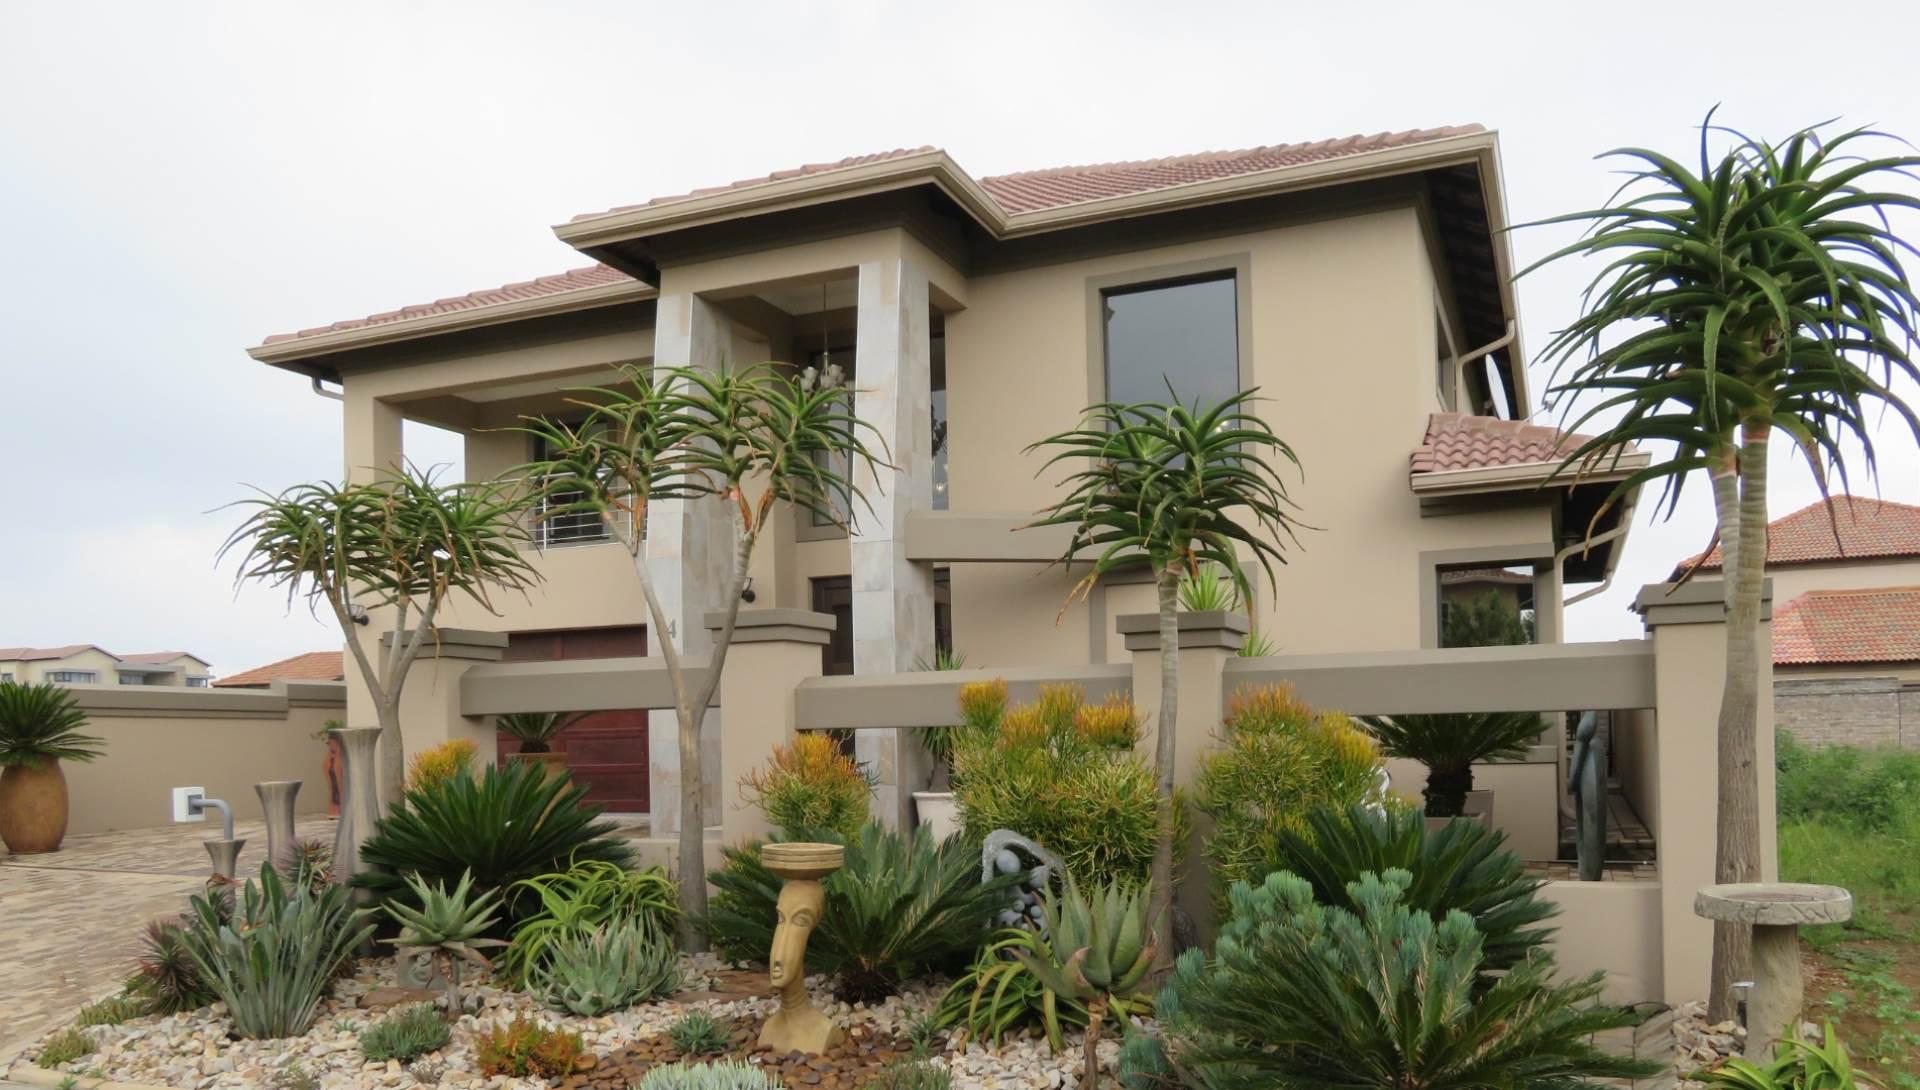 4 BedroomHouse For Sale In La Como Lifestyle Estate